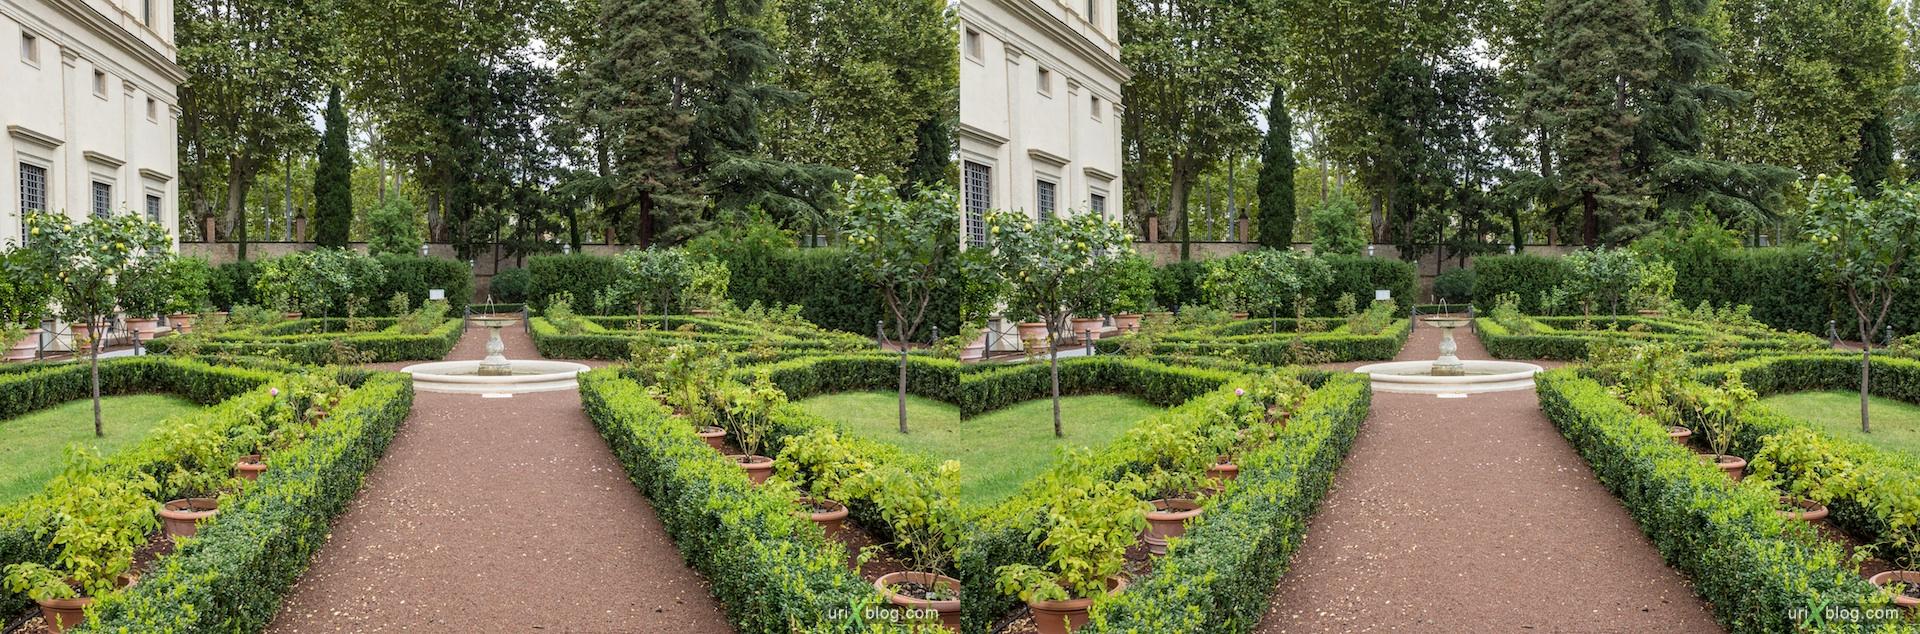 2012, Villa Farnesina, fountain, Rome, Italy, Europe, 3D, stereo pair, cross-eyed, crossview, cross view stereo pair